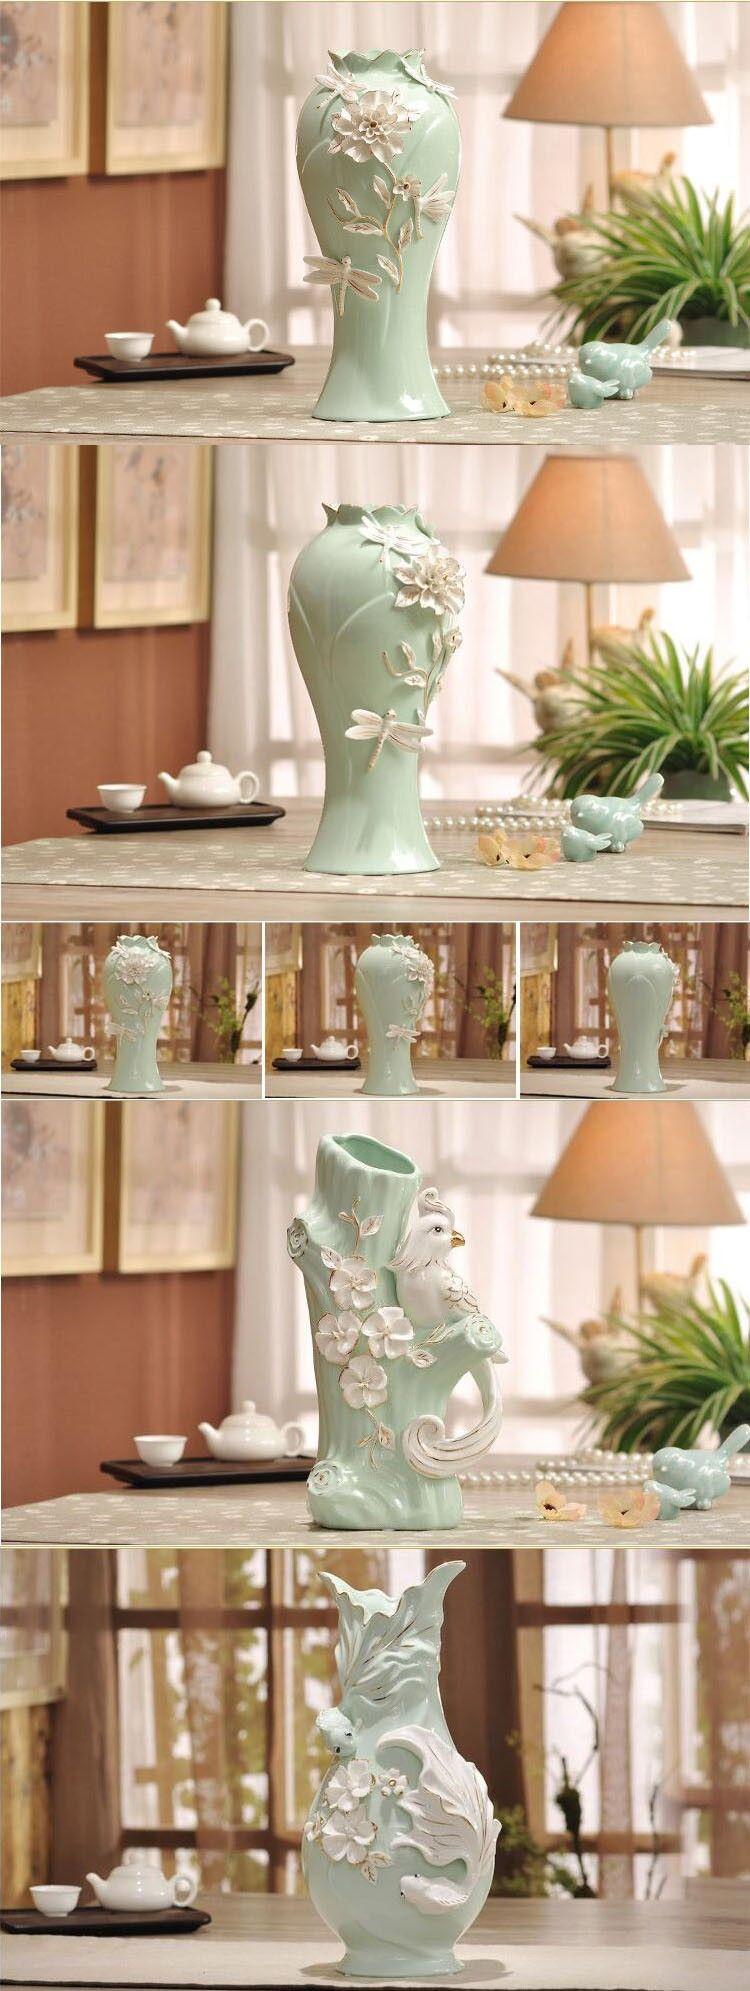 Modern exquisite sculpture elephant green cream ceramic vase modern exquisite sculpture elephant green cream ceramic vase custom design accepted view ceramic vase reviewsmspy